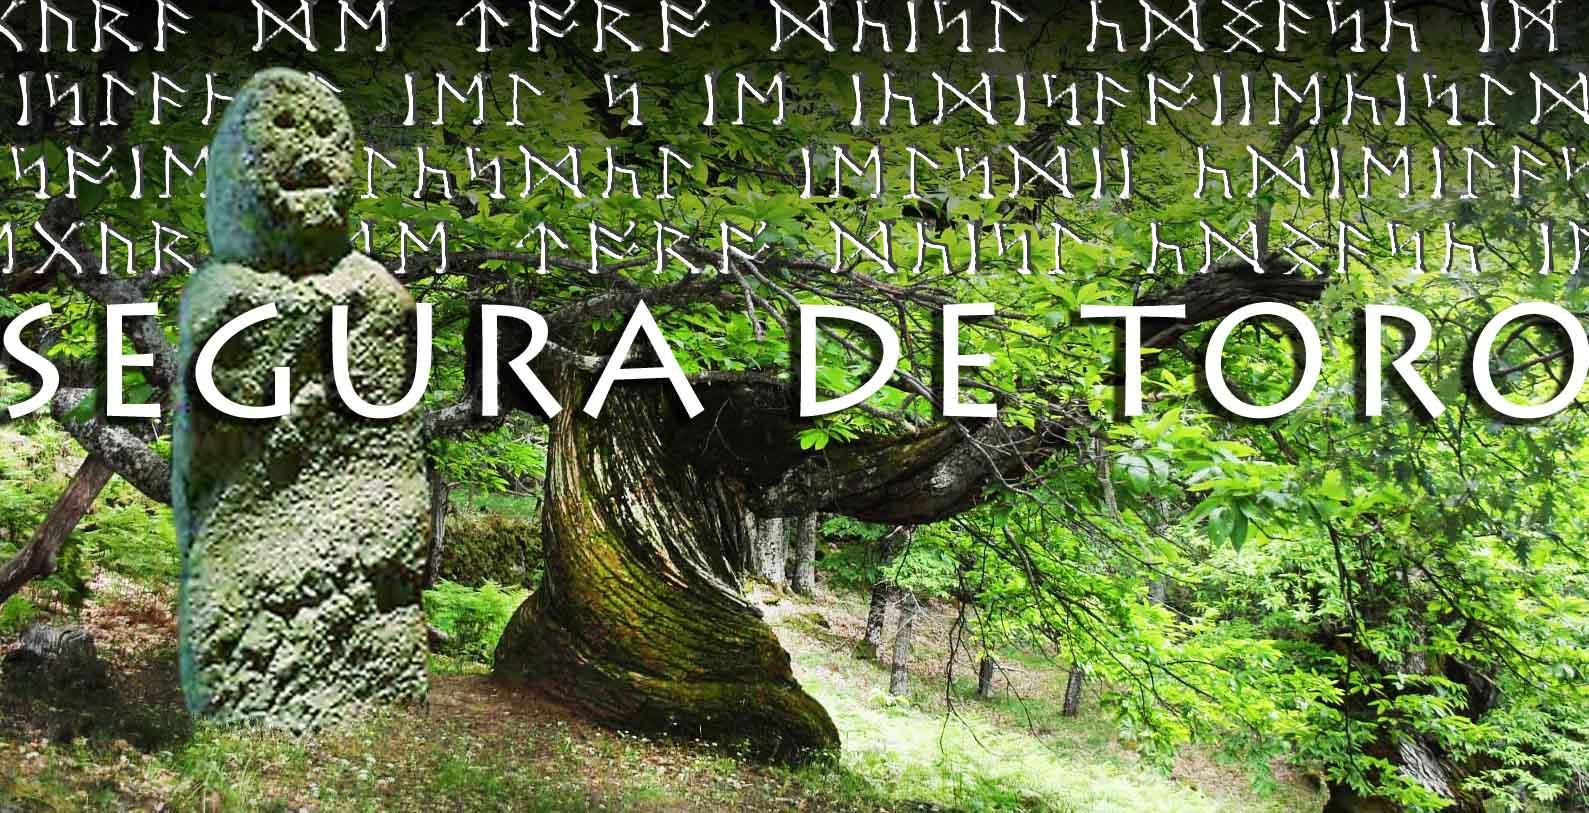 Prehistoria del Bronce en Segura de Toro (Cáceres)